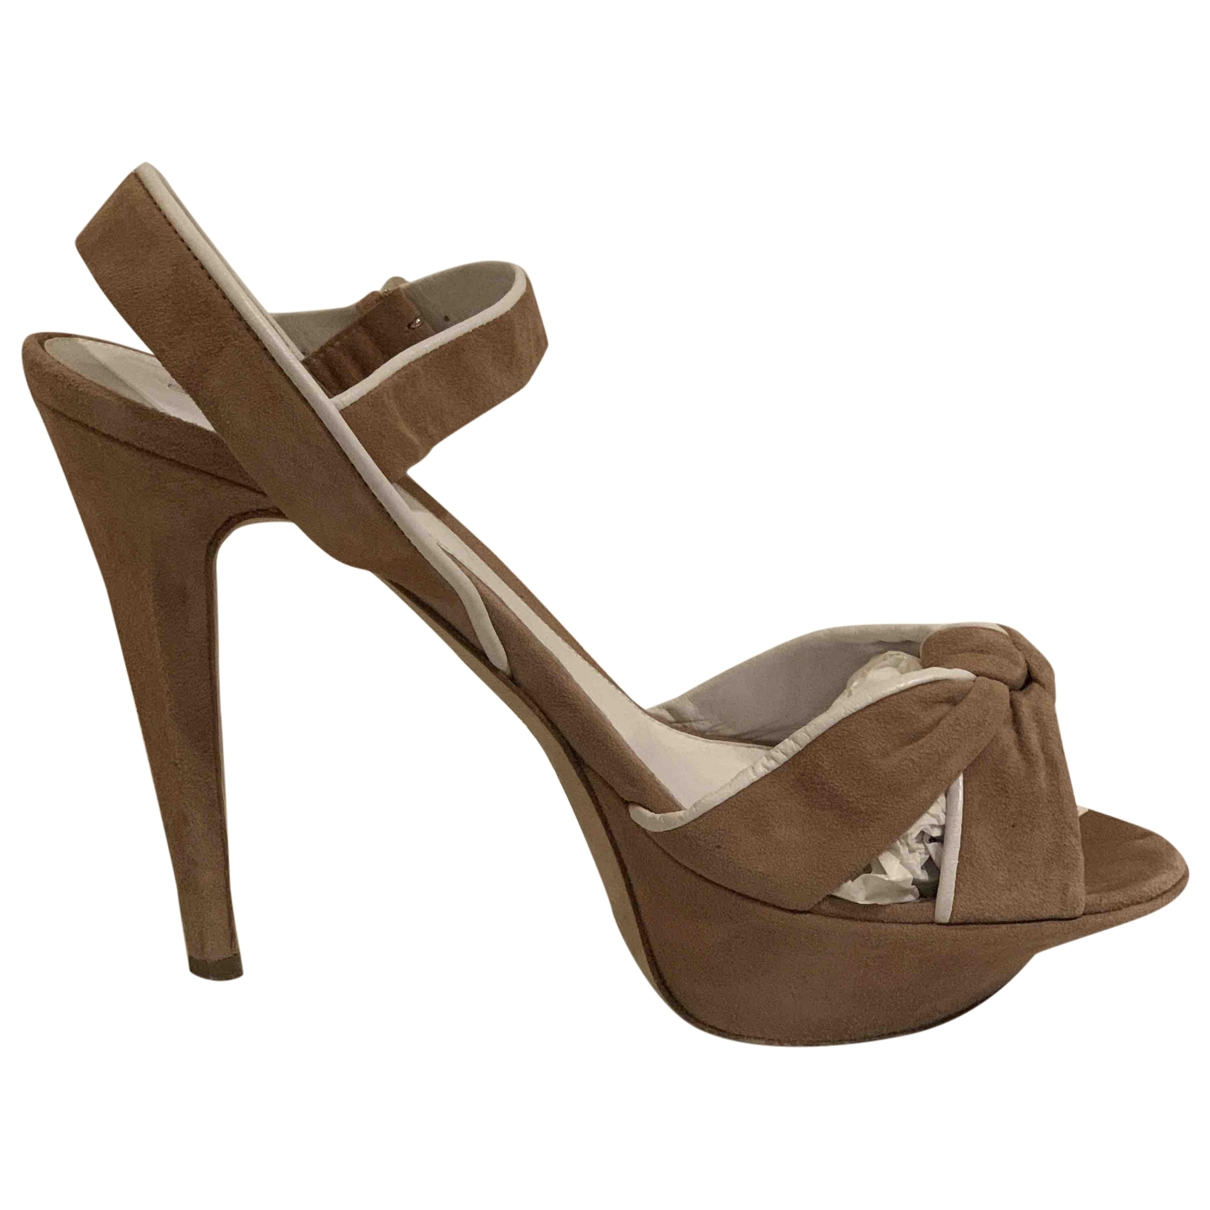 Sergio Rossi \N Beige Suede Sandals for Women 39 EU